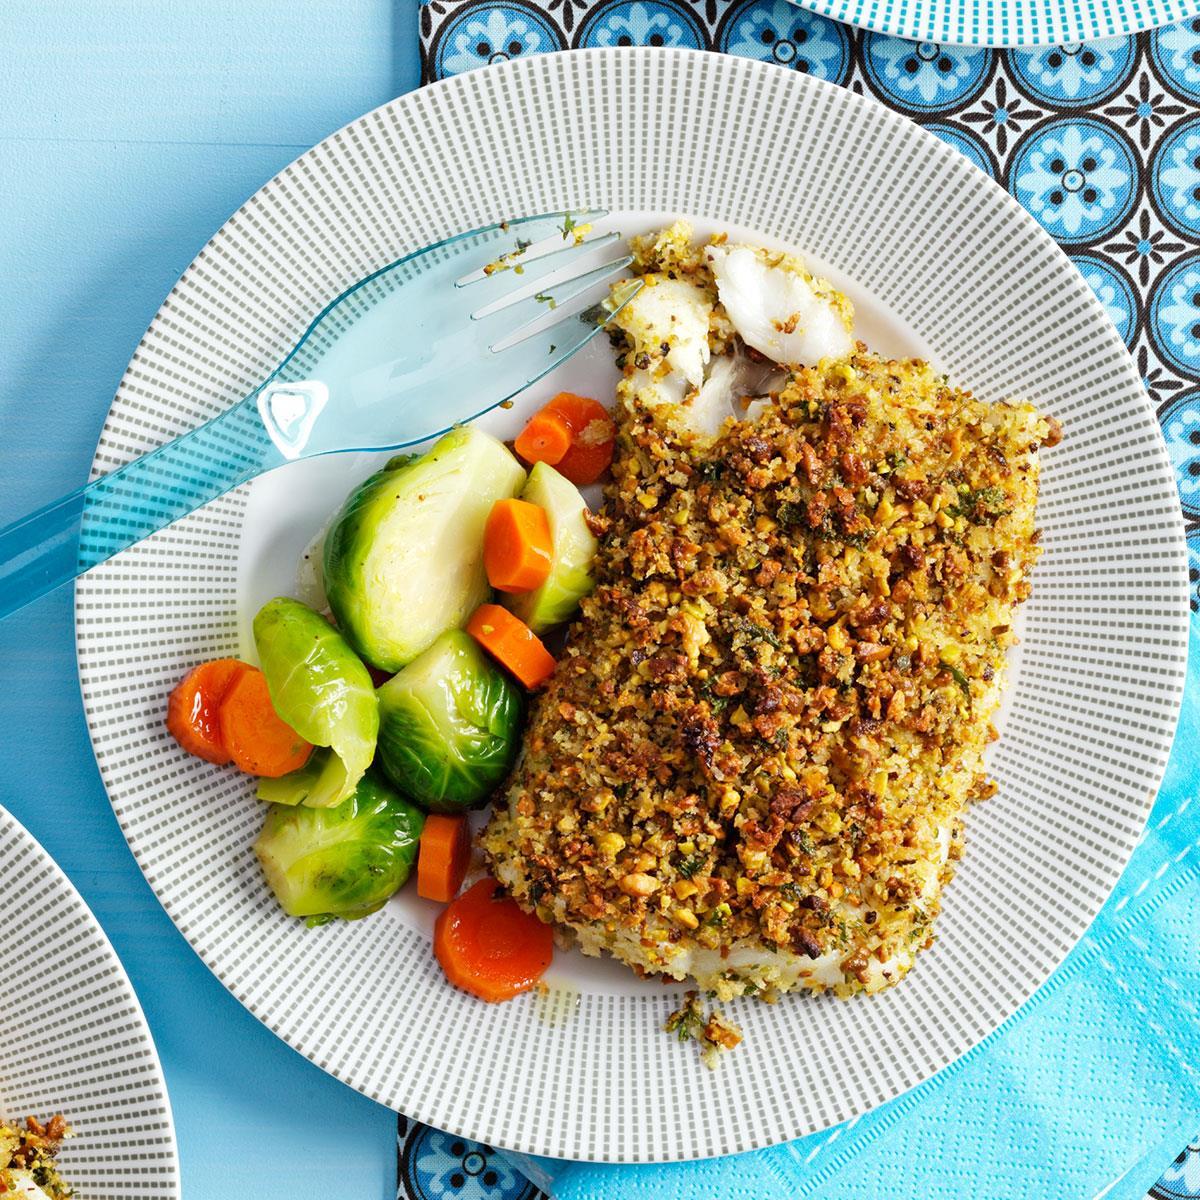 Pistachio crusted fish fillets recipe taste of home for Breaded fish recipe